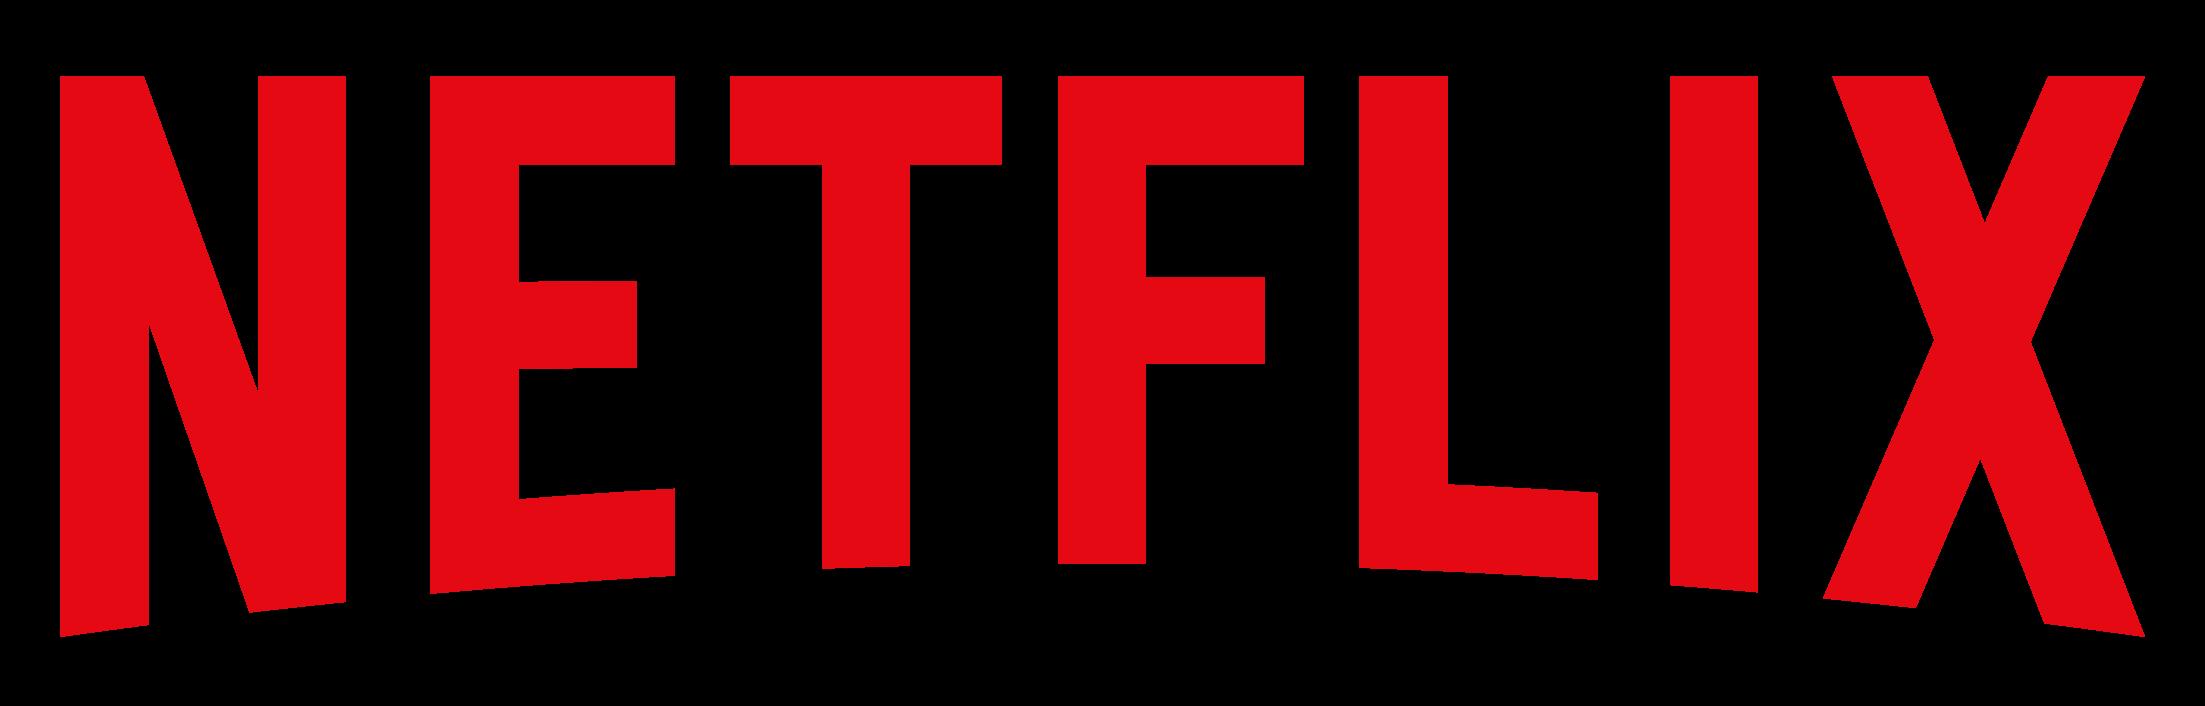 kisspng-netflix-streaming-media-television-show-logo-netflix-logo-5b35b03bb4e9d0.753613021530245179741